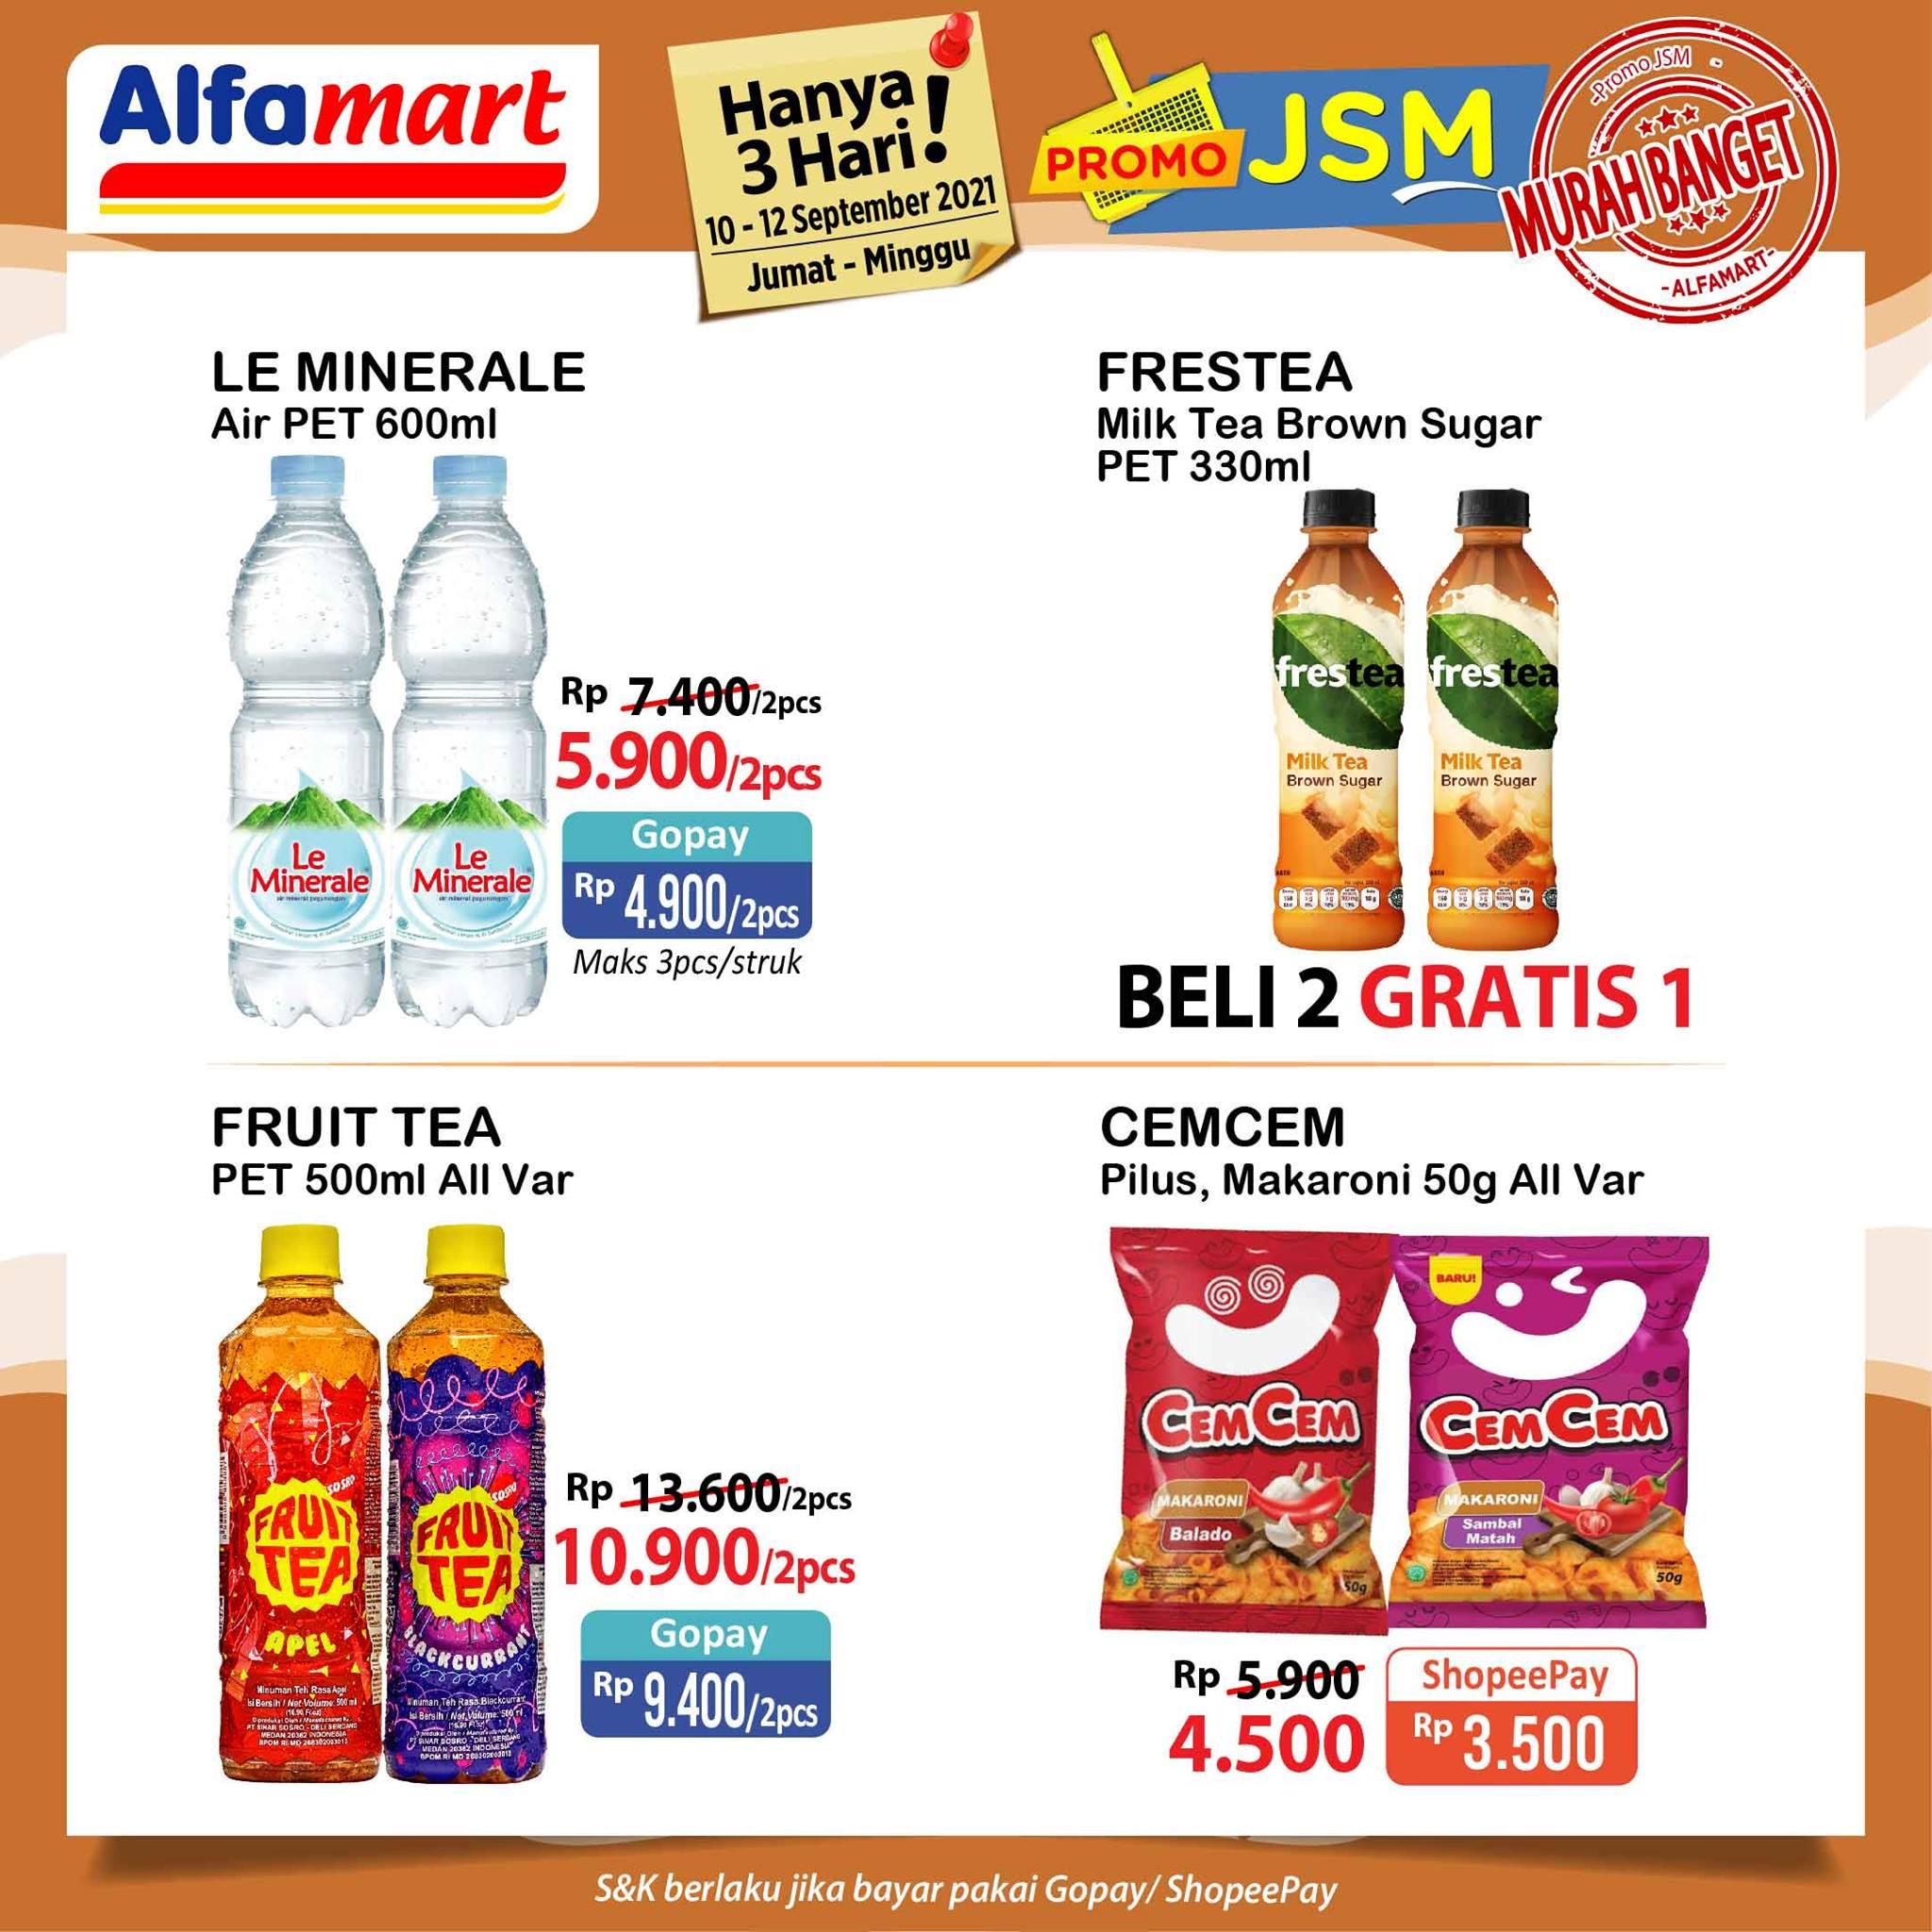 Promo ALFAMART JSM Weekend periode 10-12 September 2021